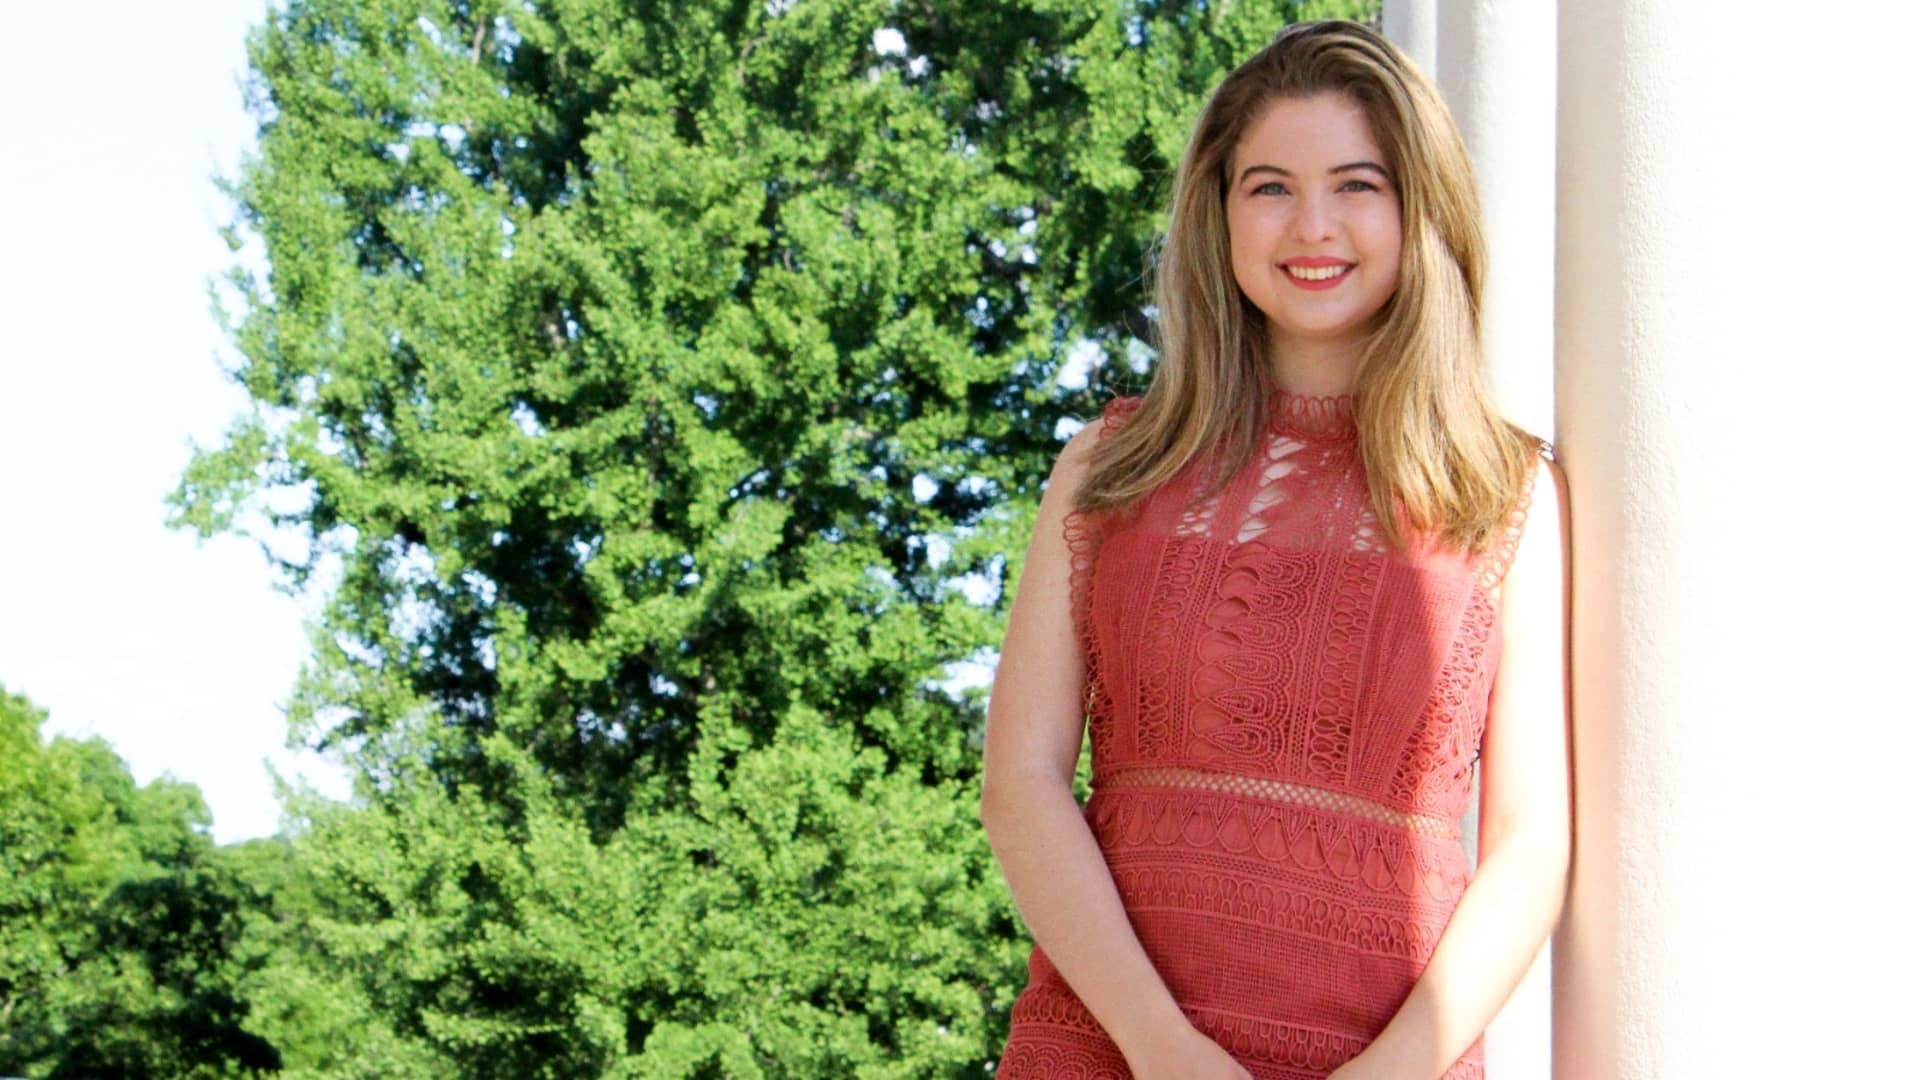 Susie Juarez, a 2021 graduate from the University of Virginia